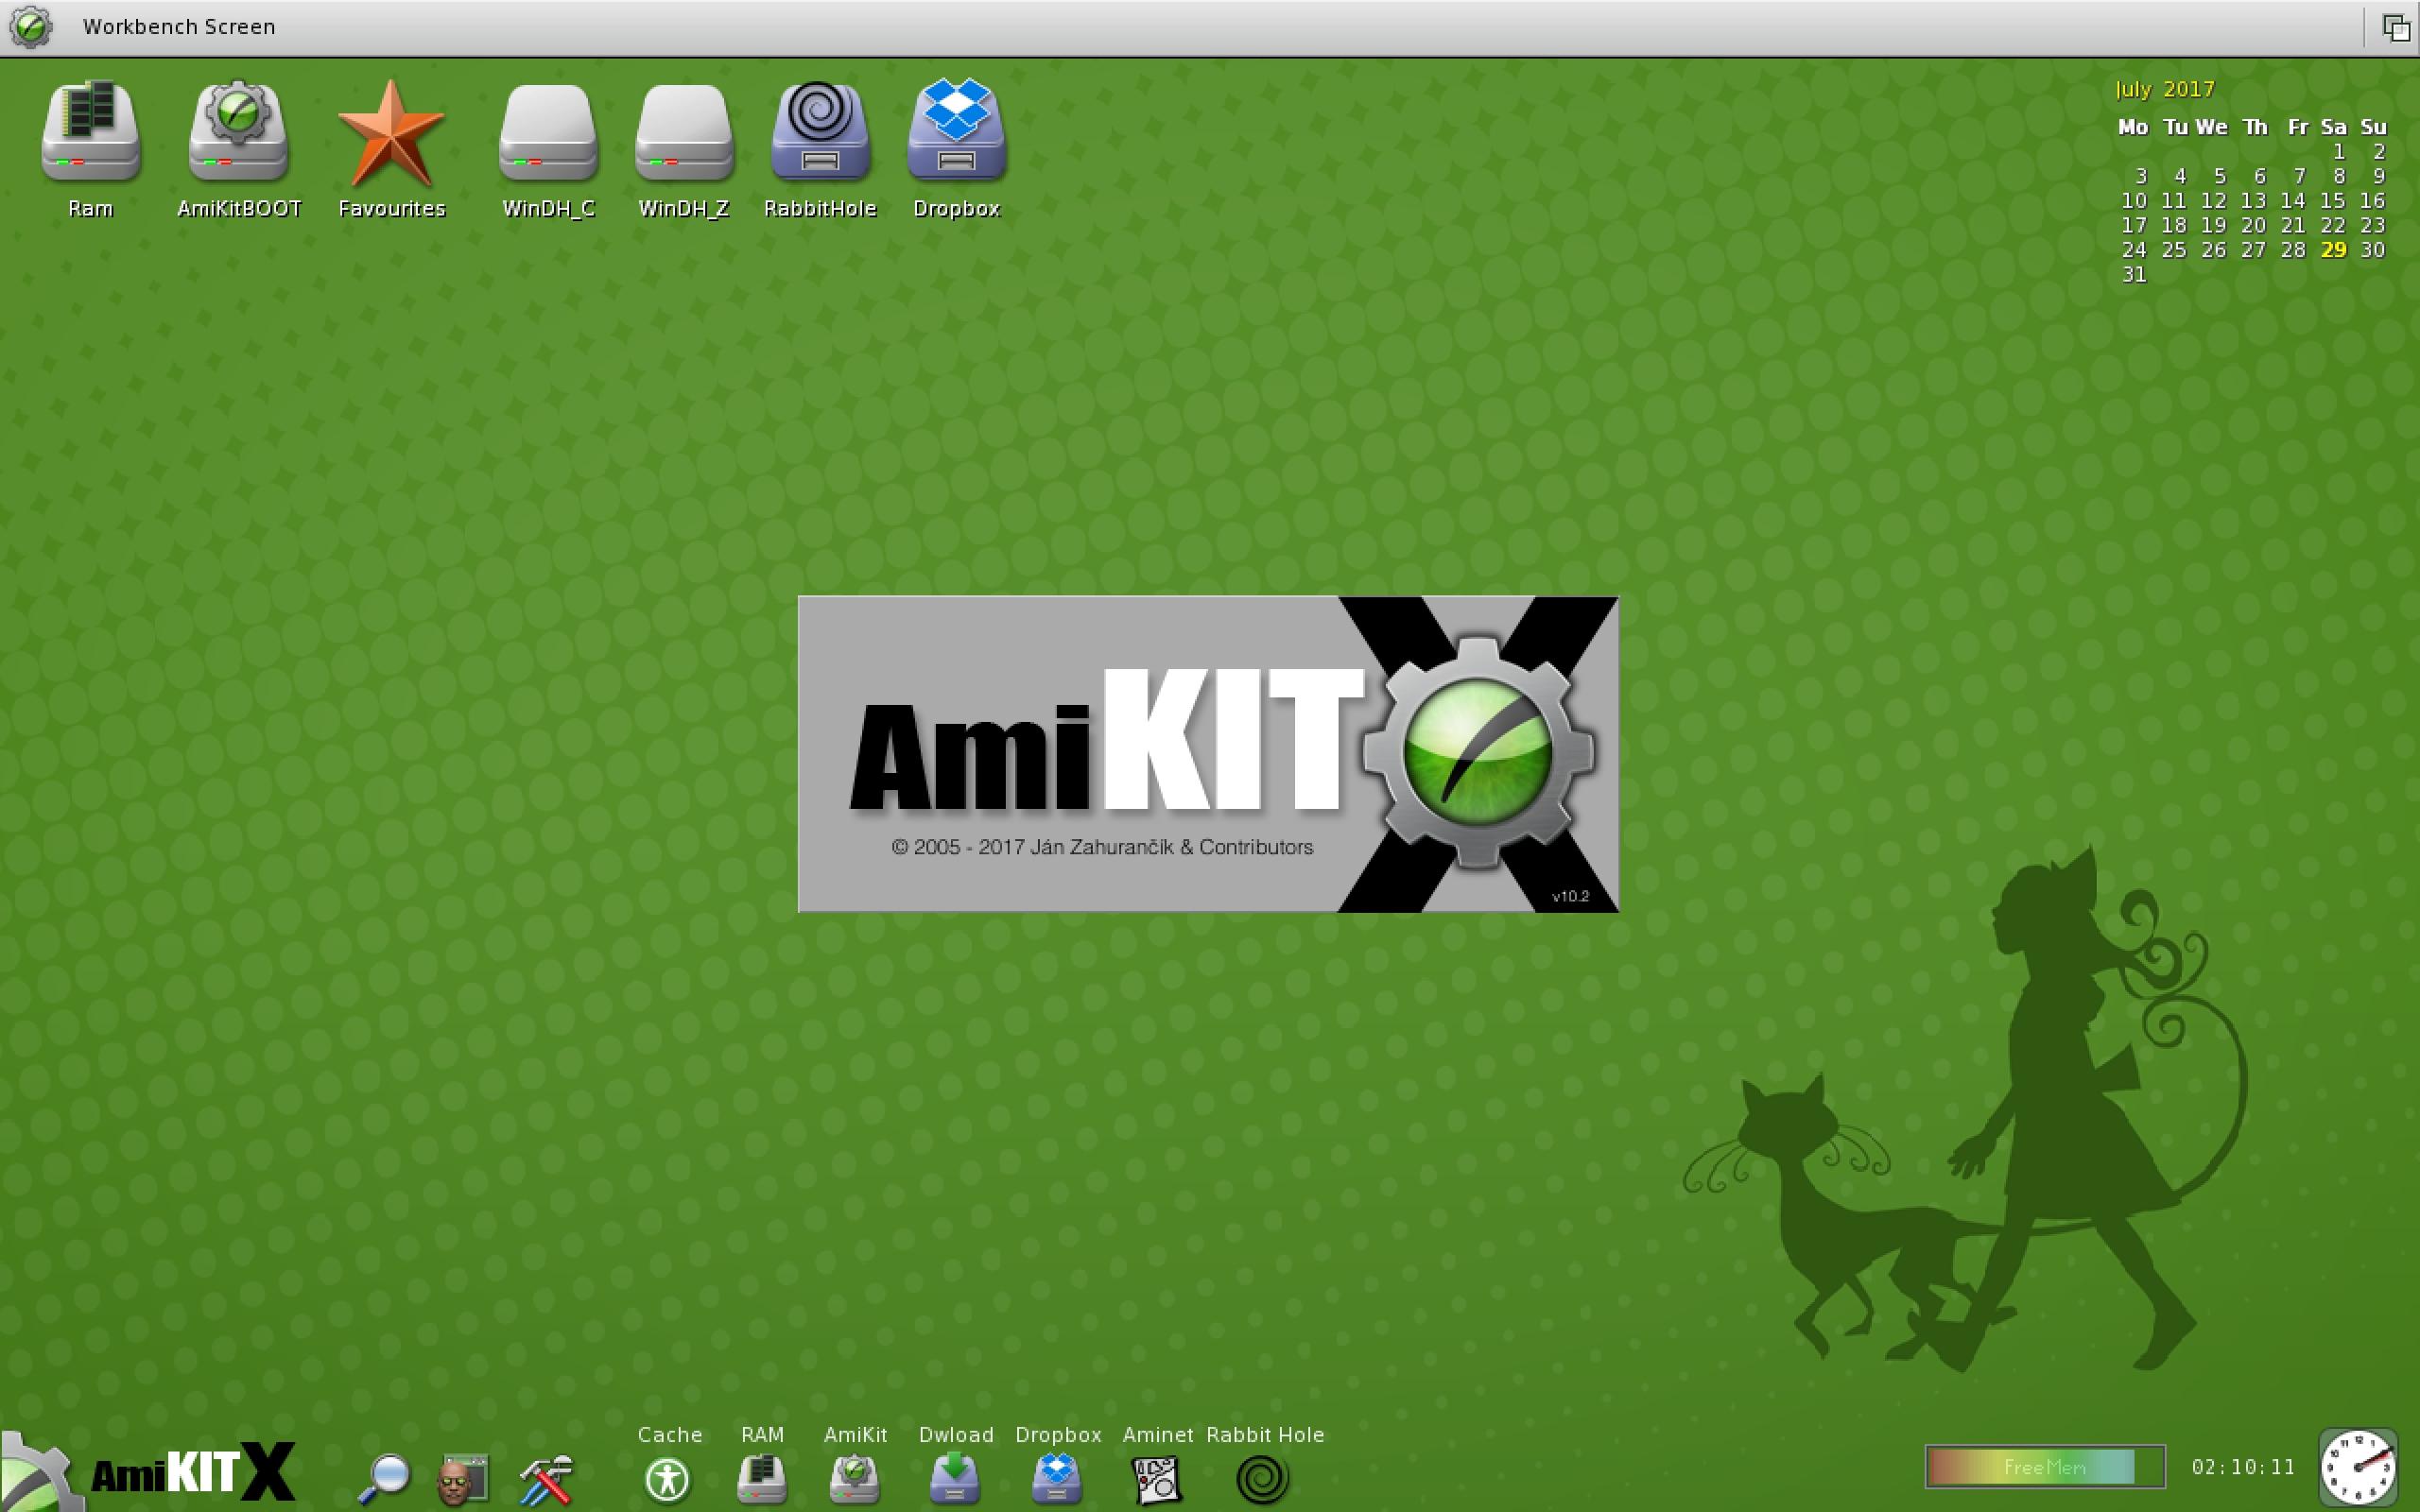 AmiKit - Wikipedia